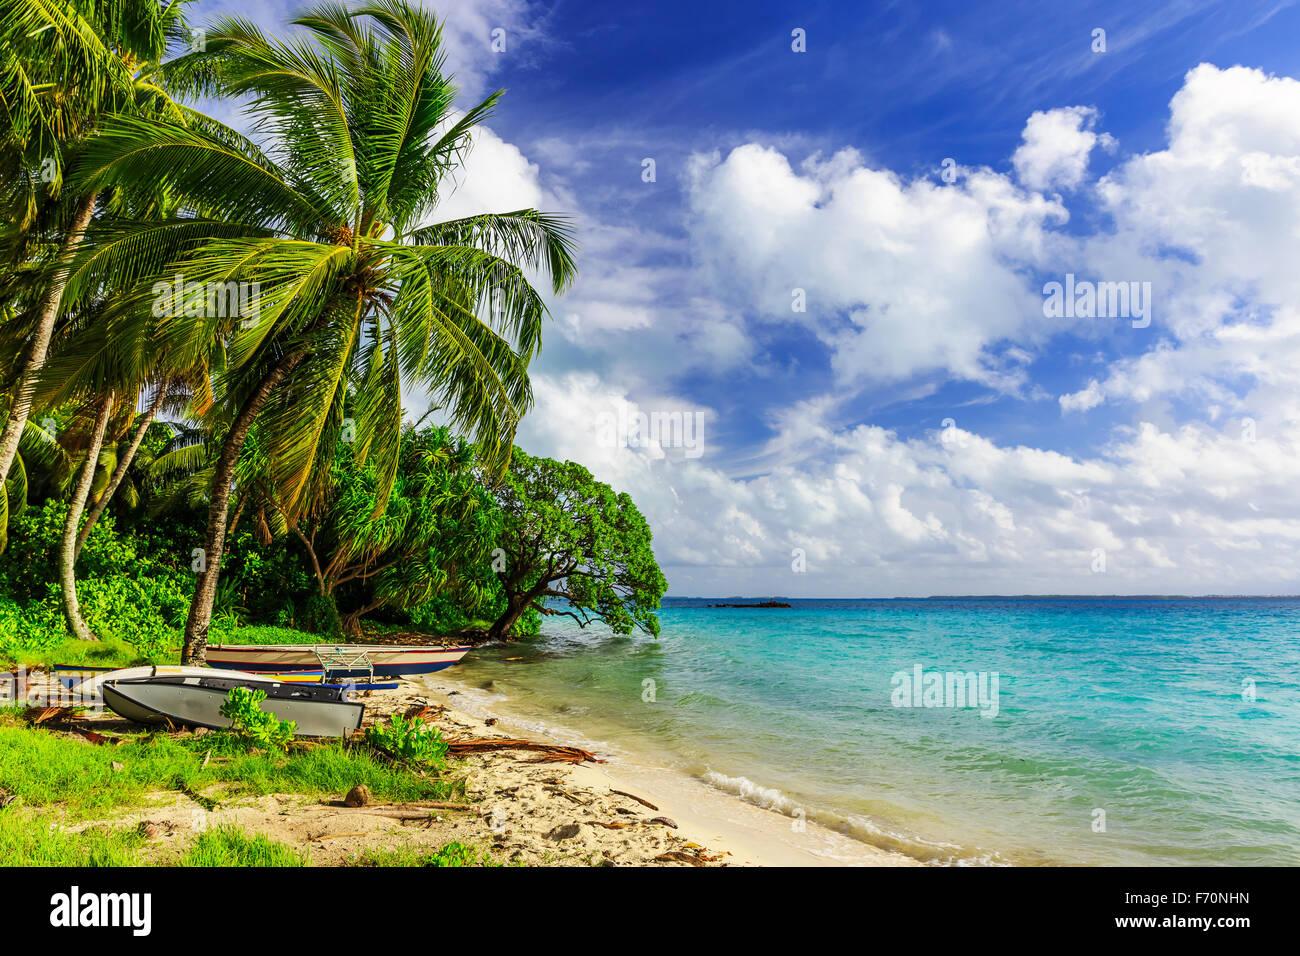 Tabuaeran beach sull'isola Fanning, Repubblica di Kiribati Immagini Stock